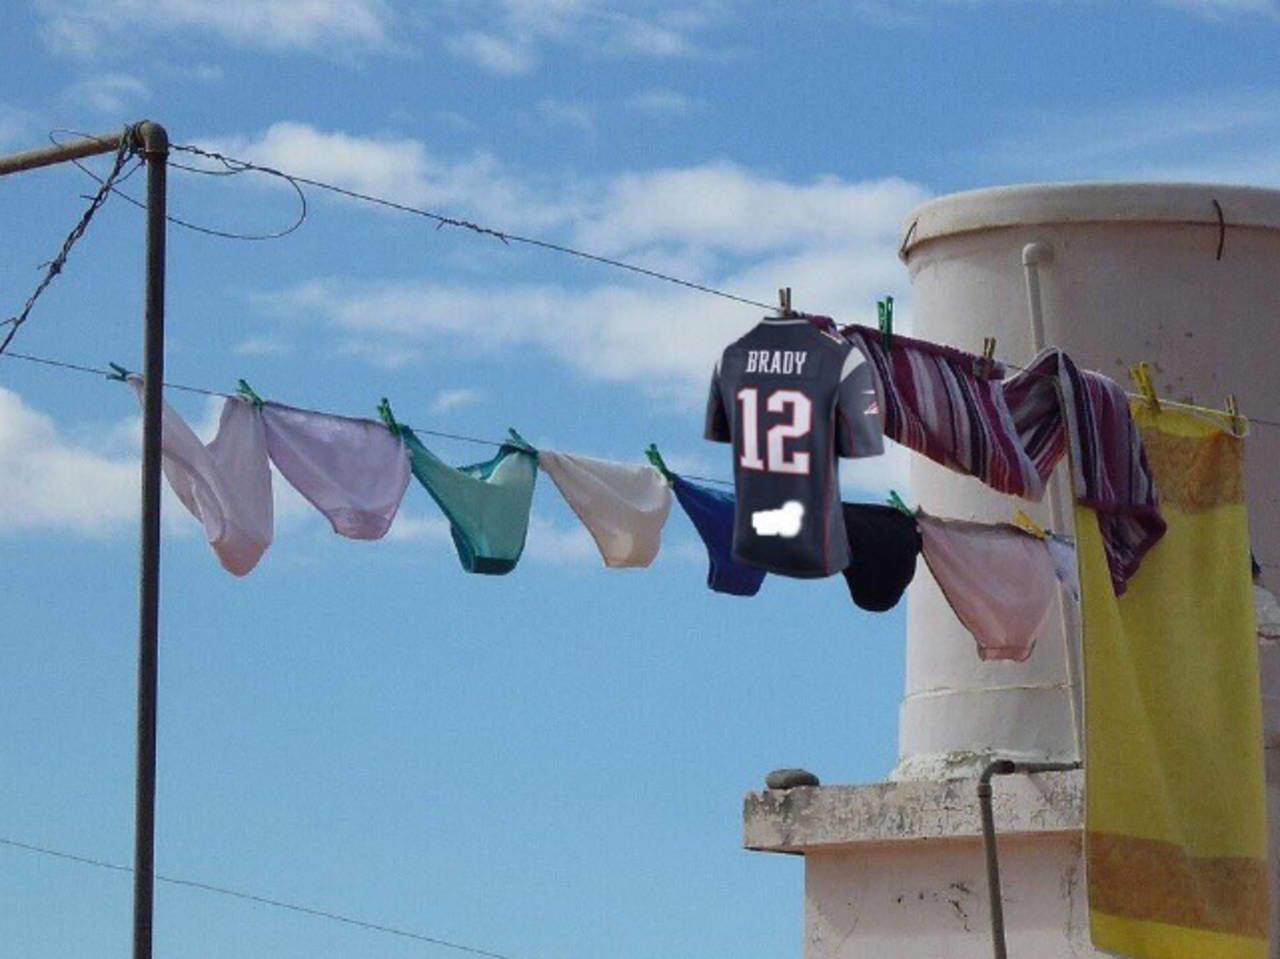 Mexicano robó jersey de Brady